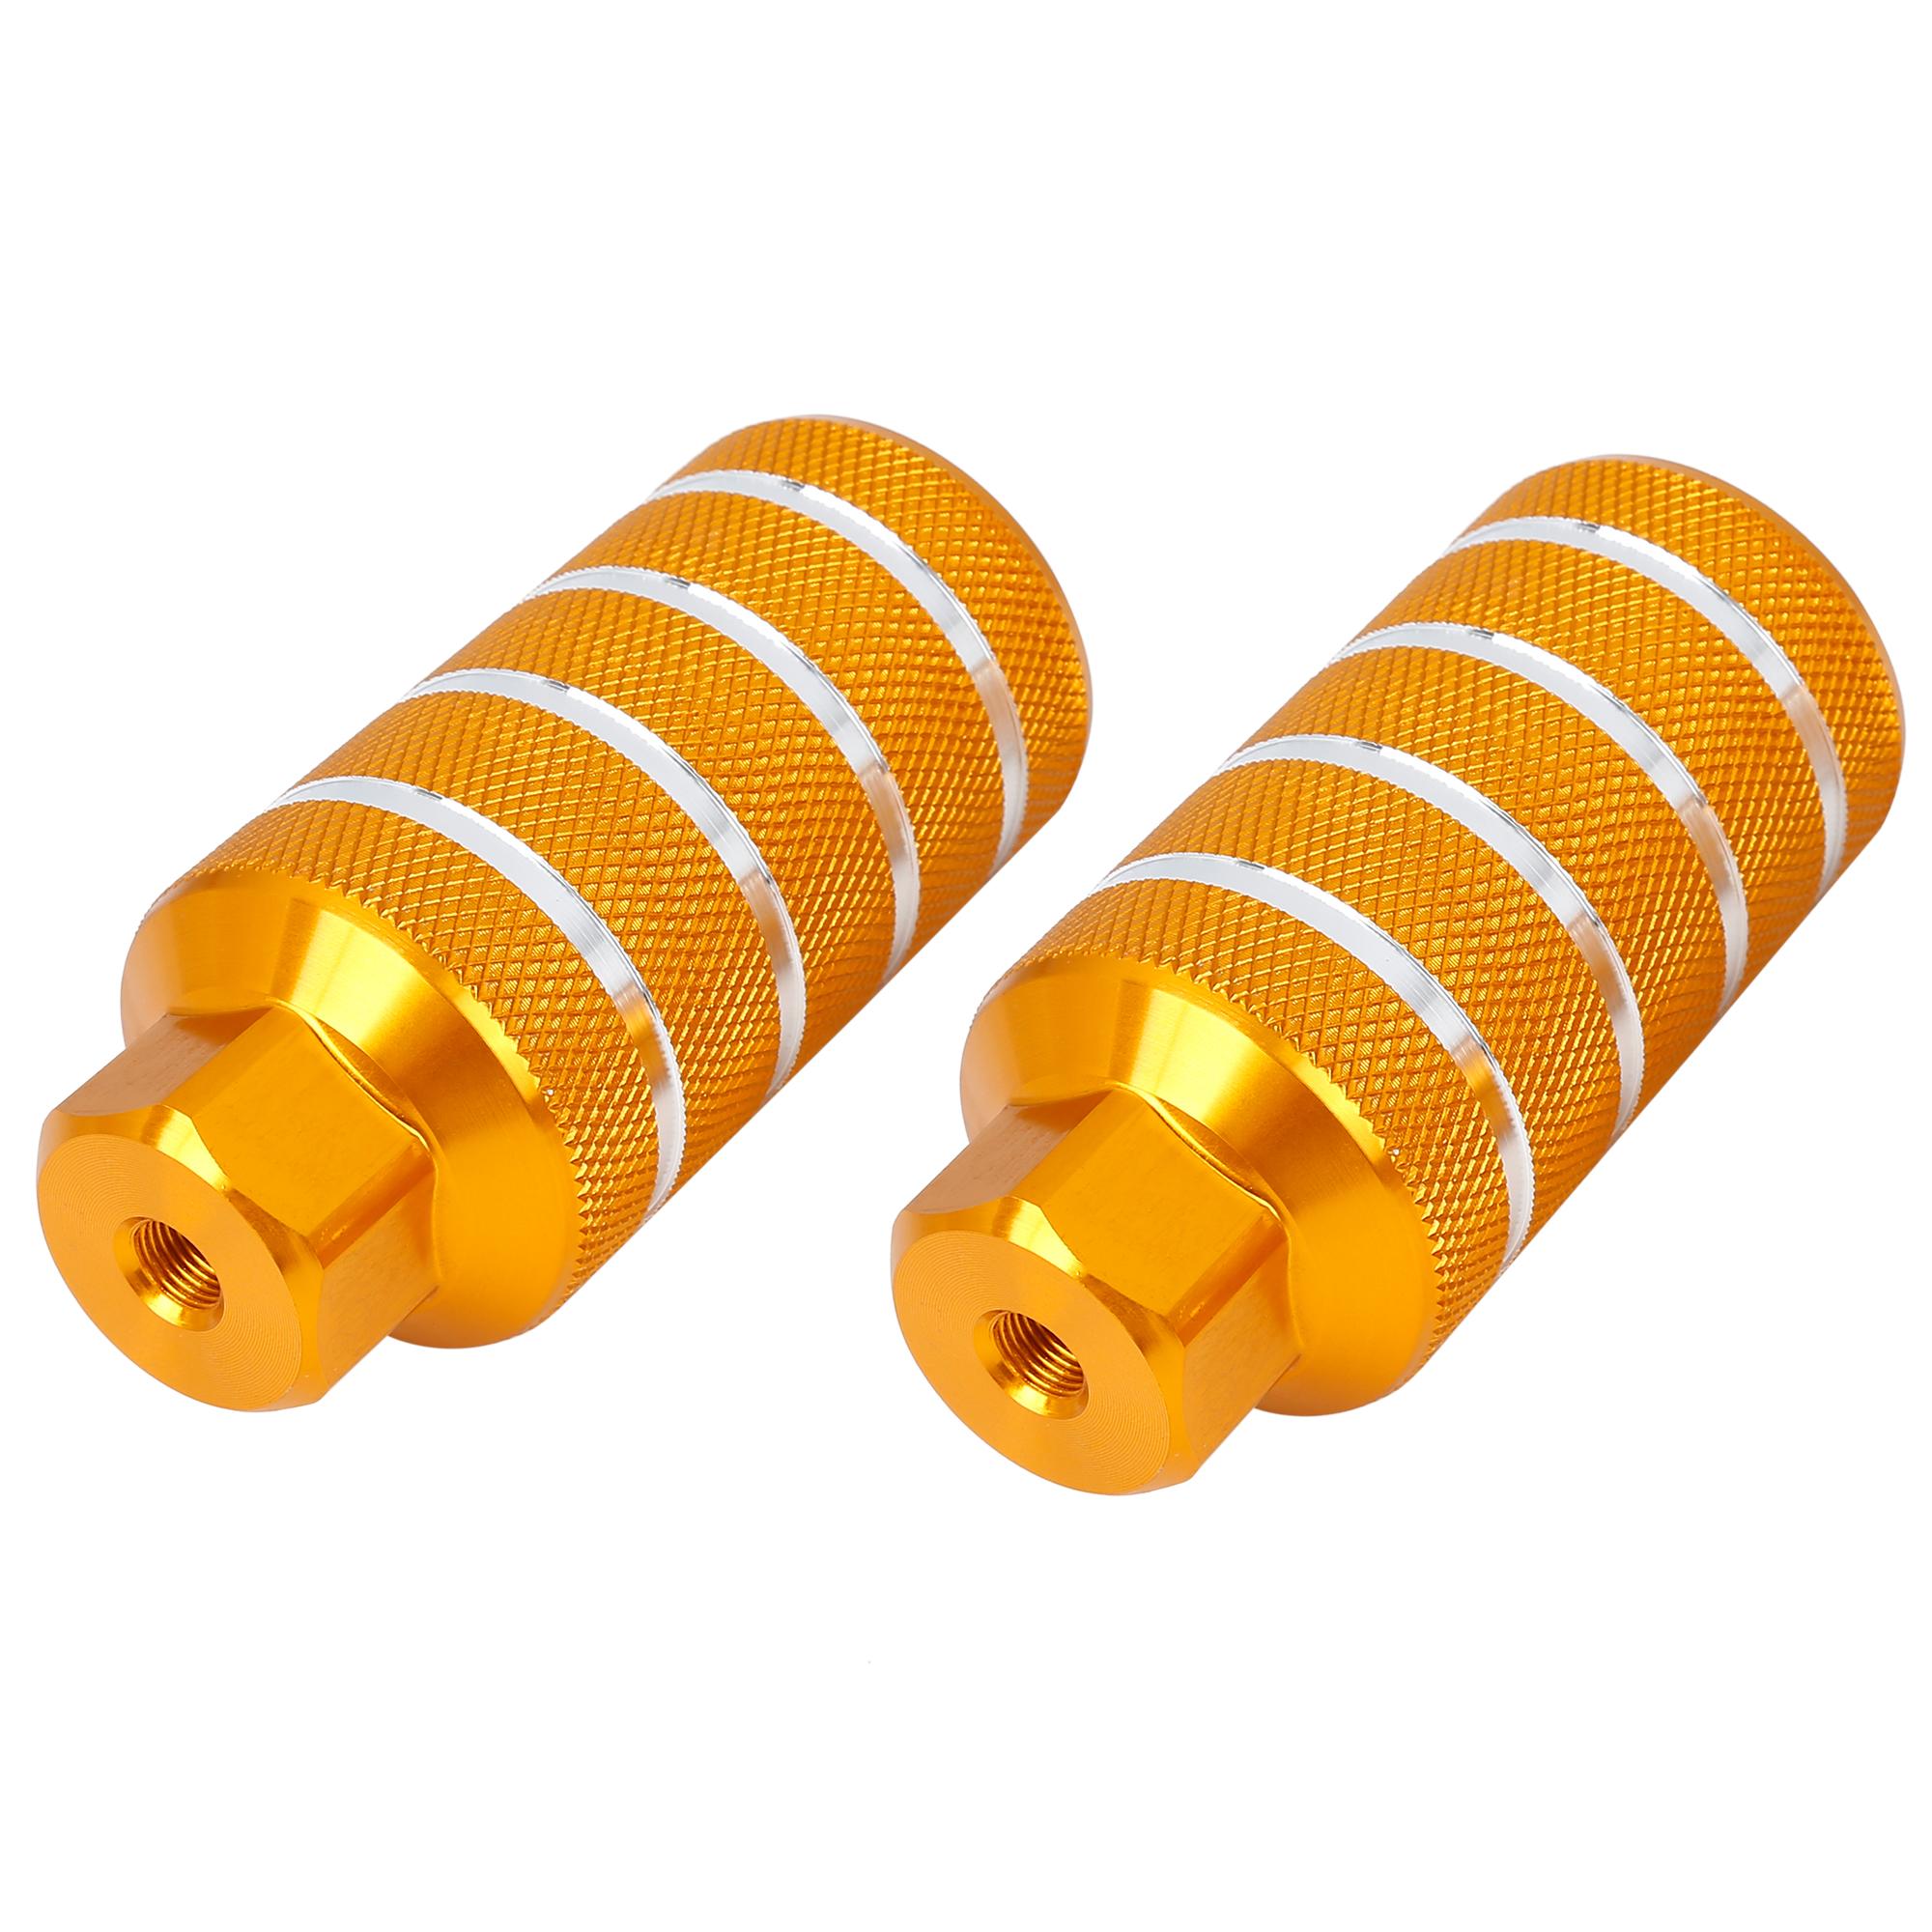 Pair Stripe Cylinder Bike Axle Rear Foot Pegs Fit 3/8 Inch 110x50mm Orange